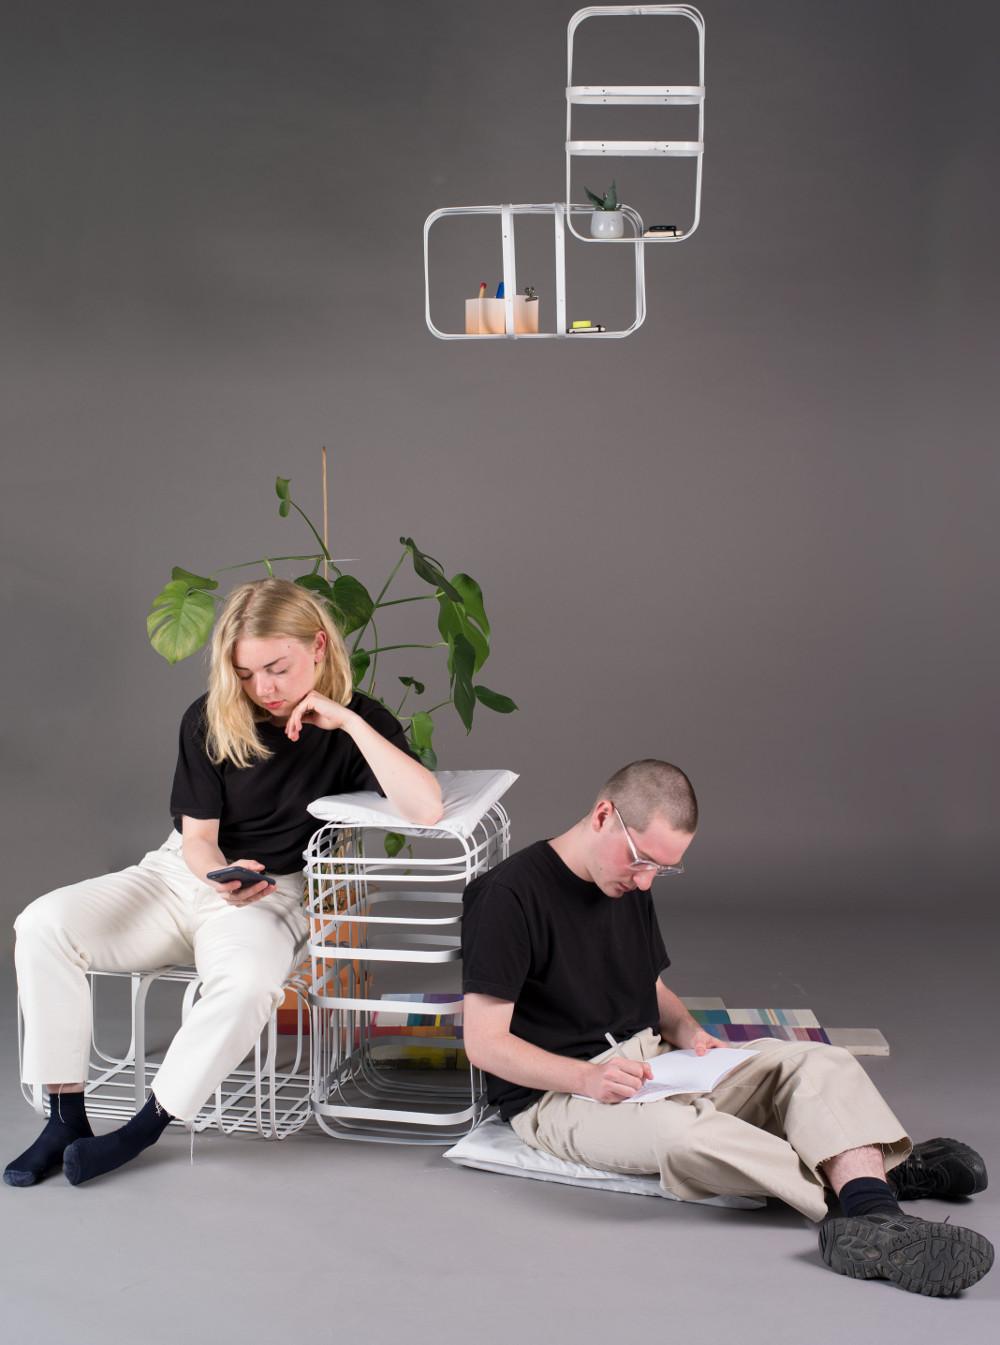 Projet Iso par Lina Abssi et Samuel Amiens